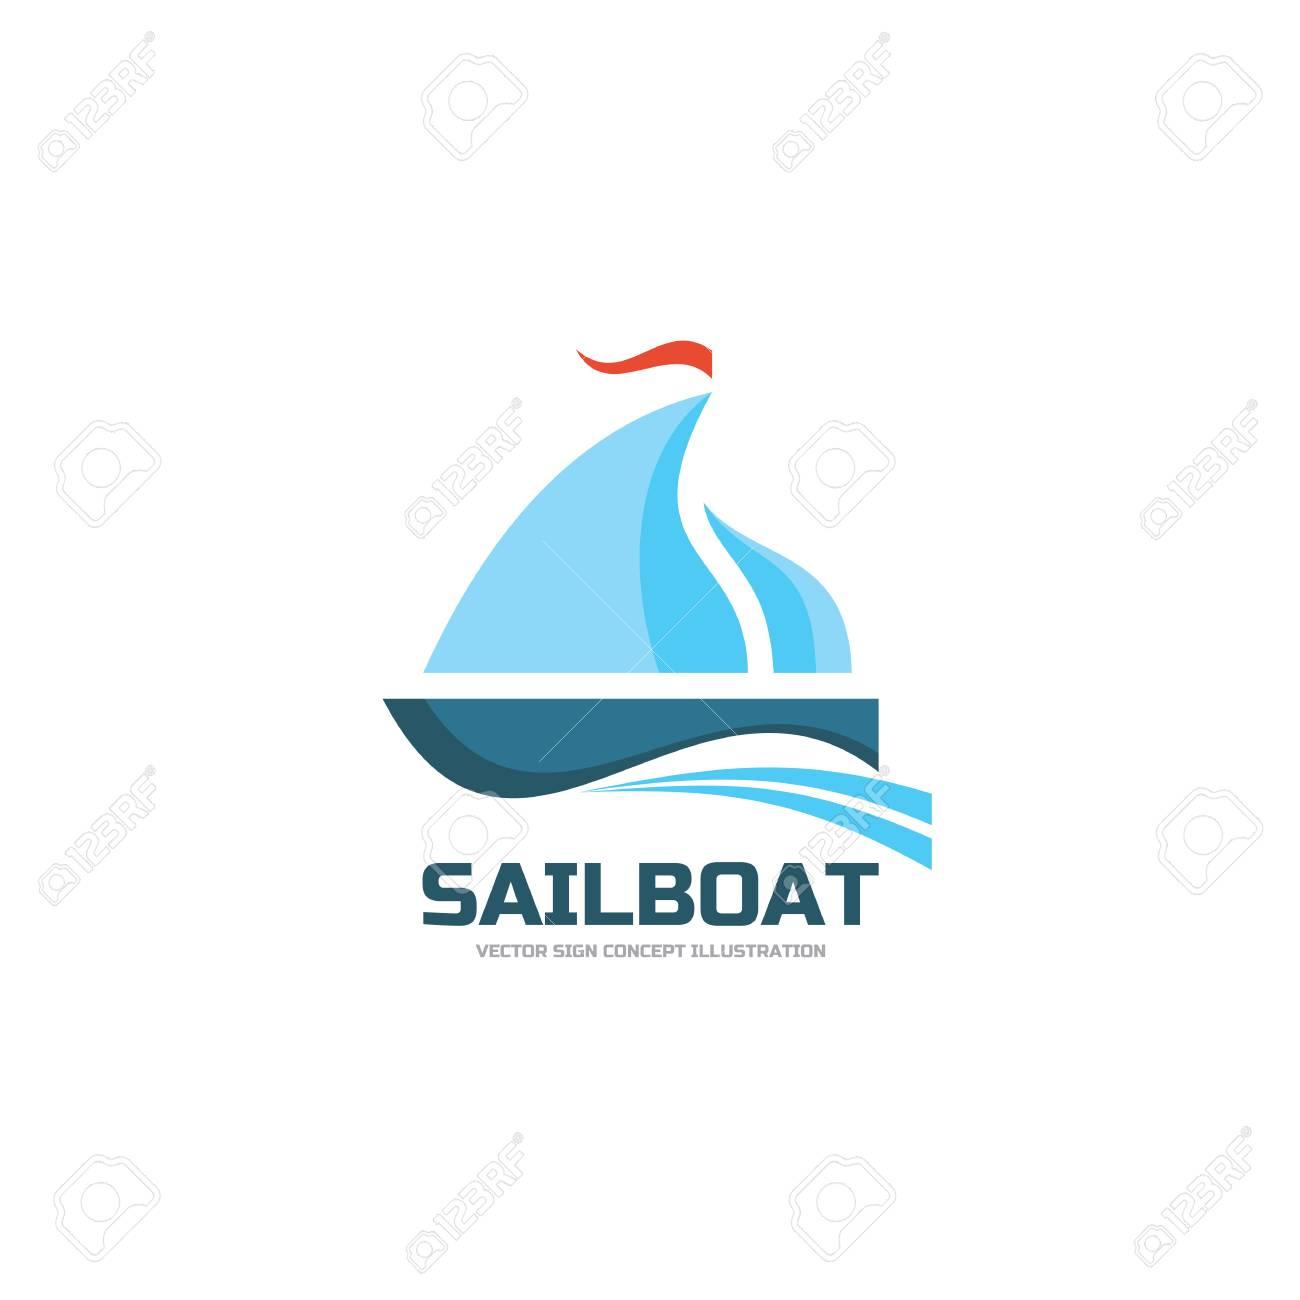 sailboat vector logo concept illustration ship sign sea trip